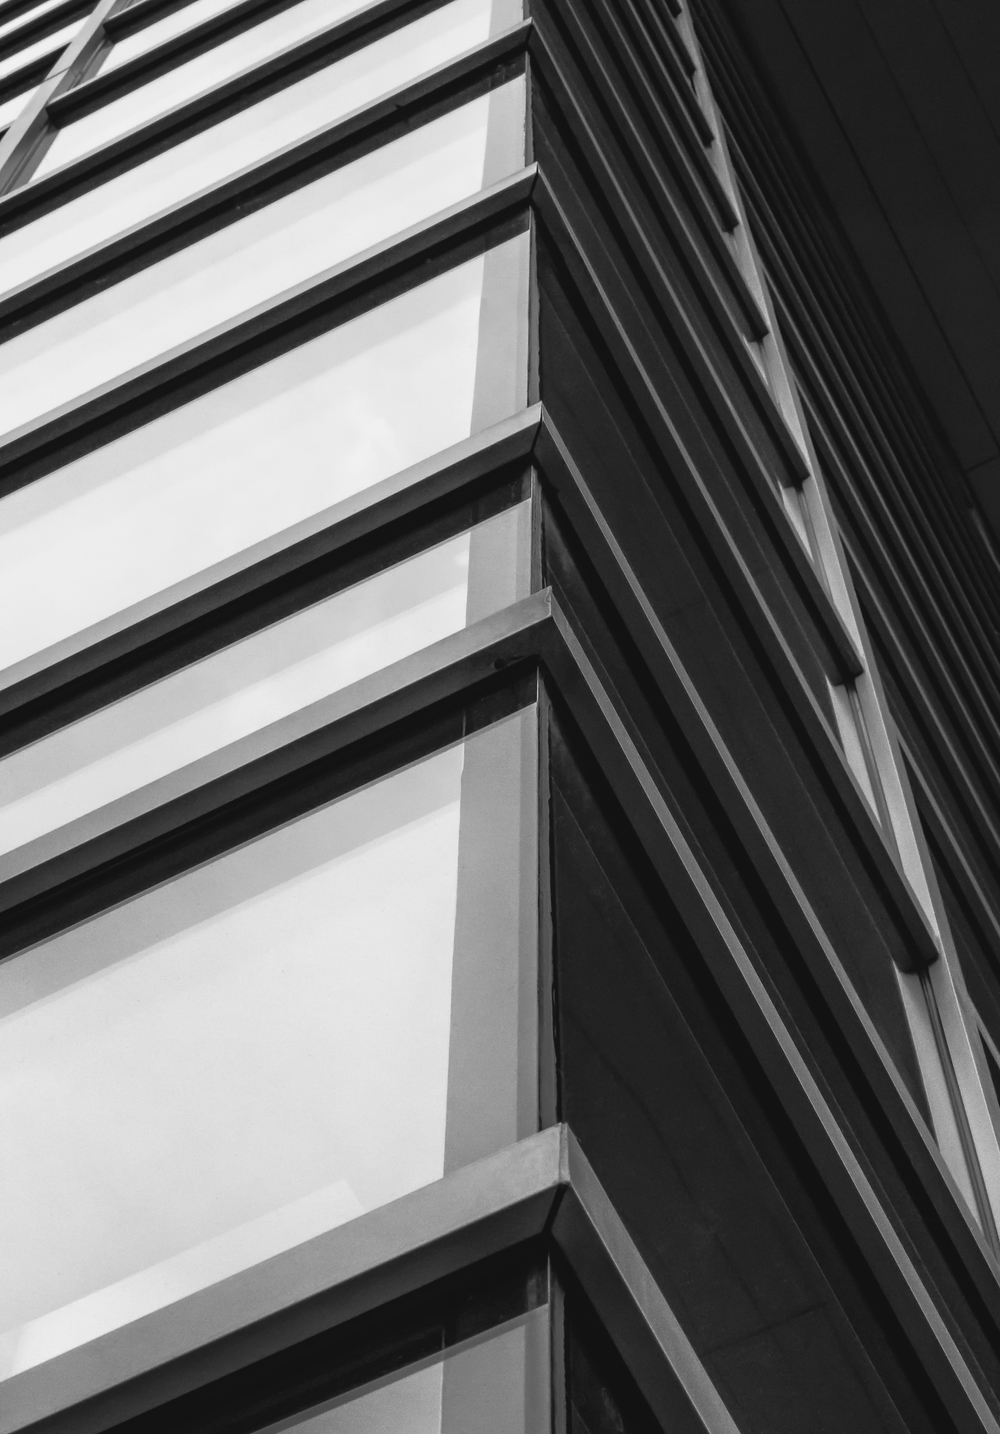 Stephen_Crossan_Aberdeen_Building-2.jpg